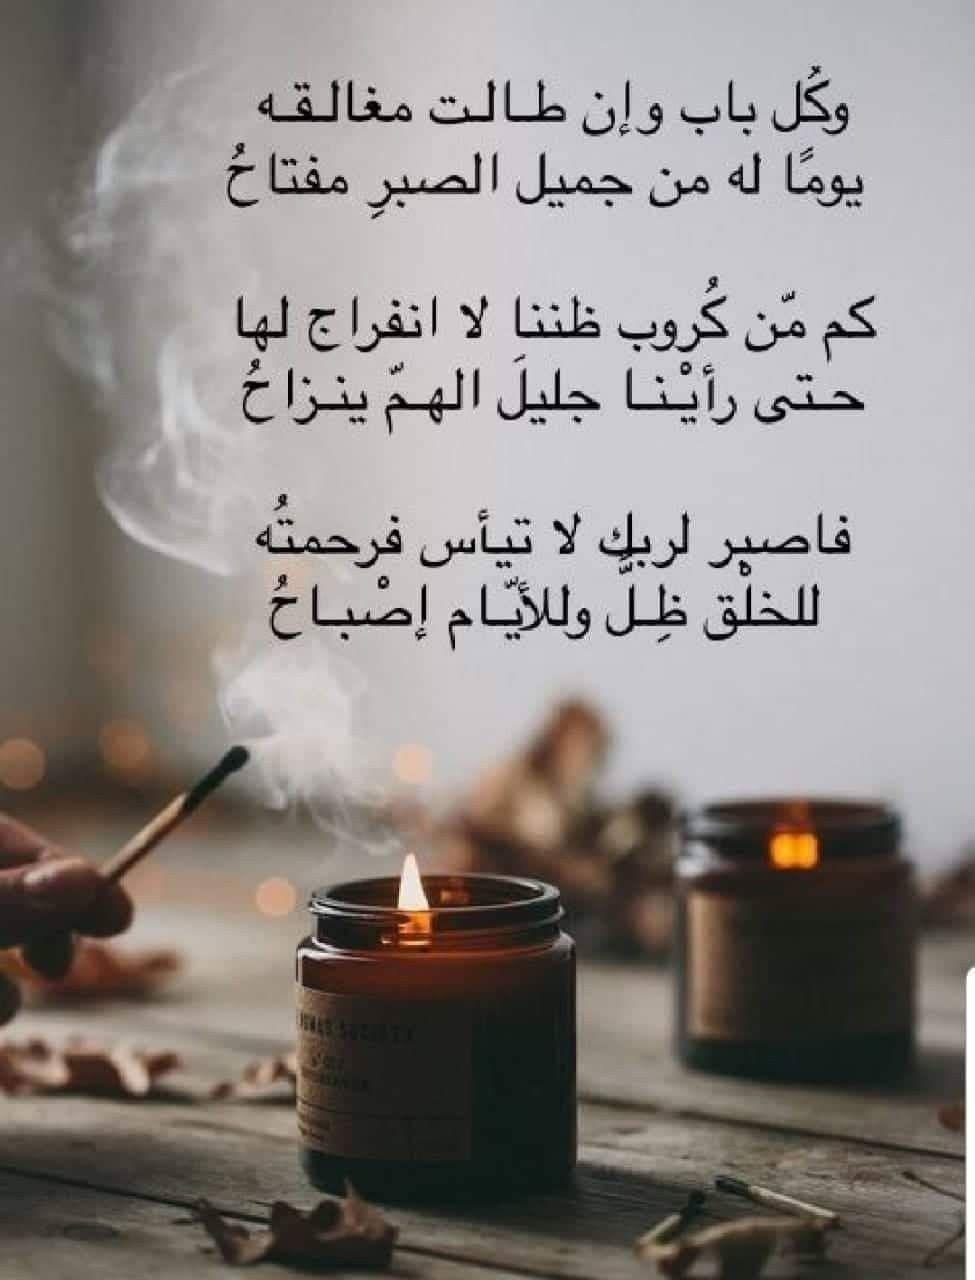 الصبر مفتاح الفرج Words Quotes Islamic Inspirational Quotes Wisdom Quotes